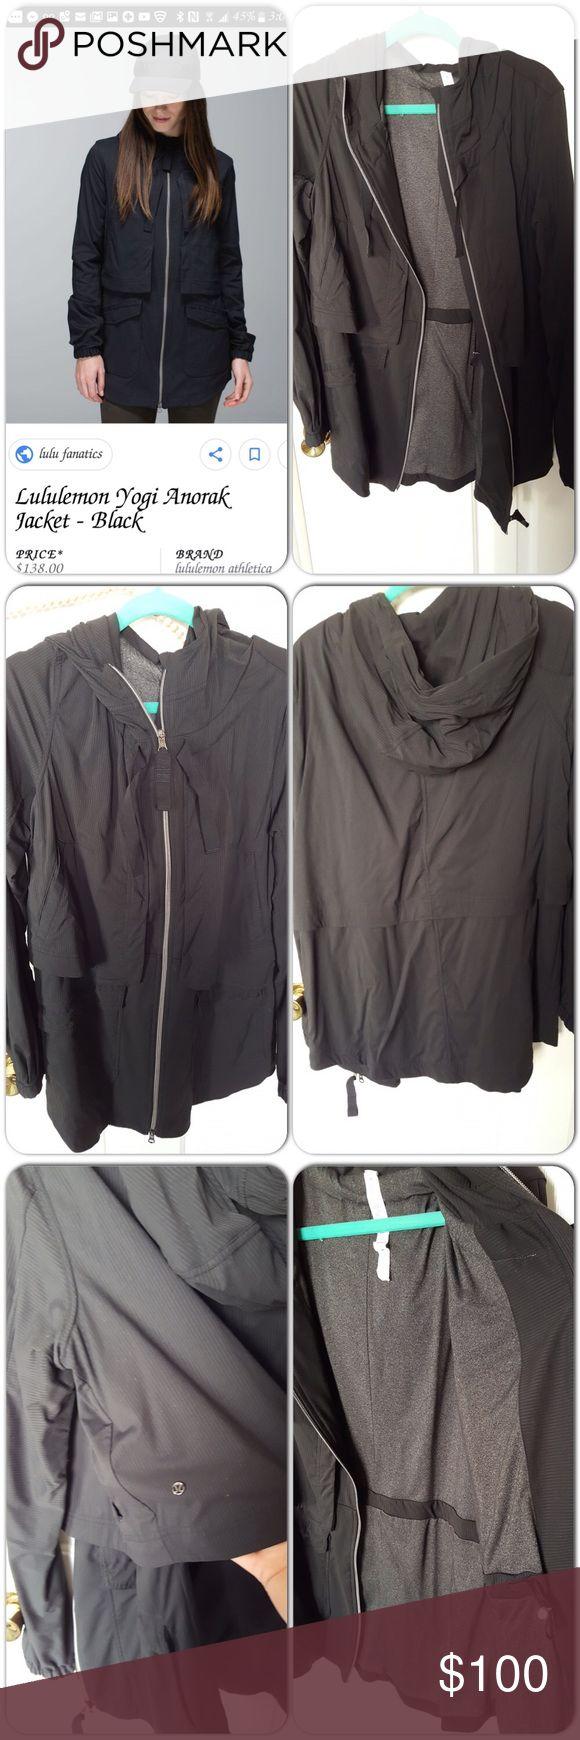 Lululemon anorak Like new condition, double layers, lots of pockets, light jacket, great for layering. lululemon athletica Jackets & Coats Utility Jackets